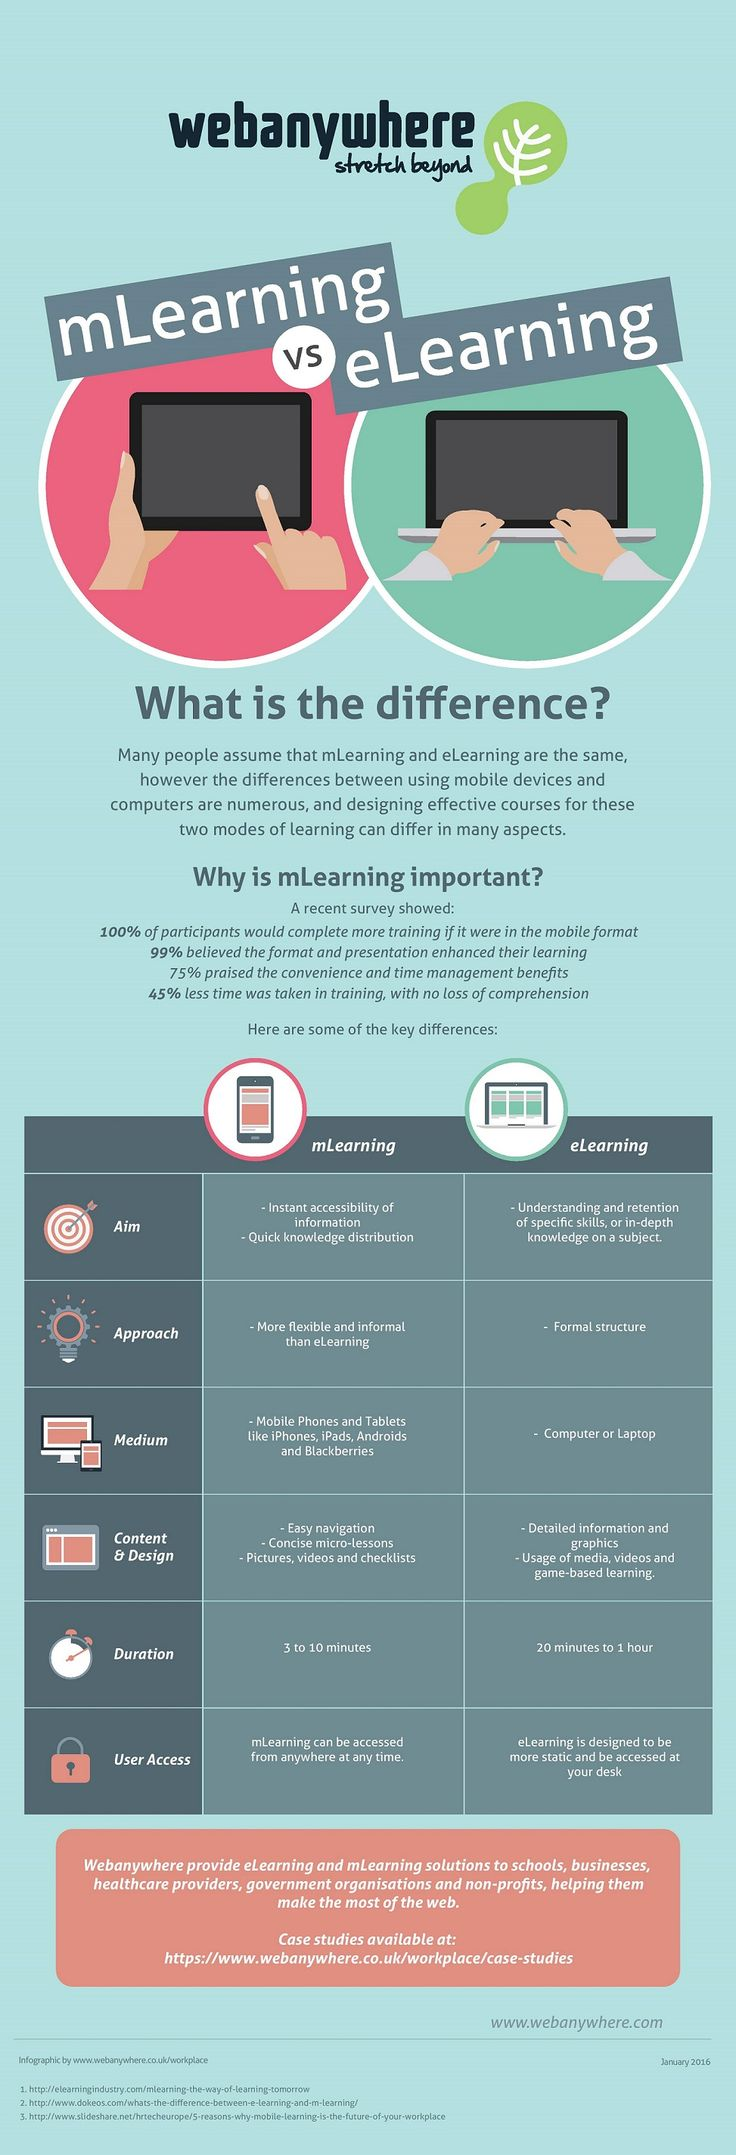 mLearning vs eLearning Infographic - http://elearninginfographics.com/mlearning-vs-elearning-infographic/